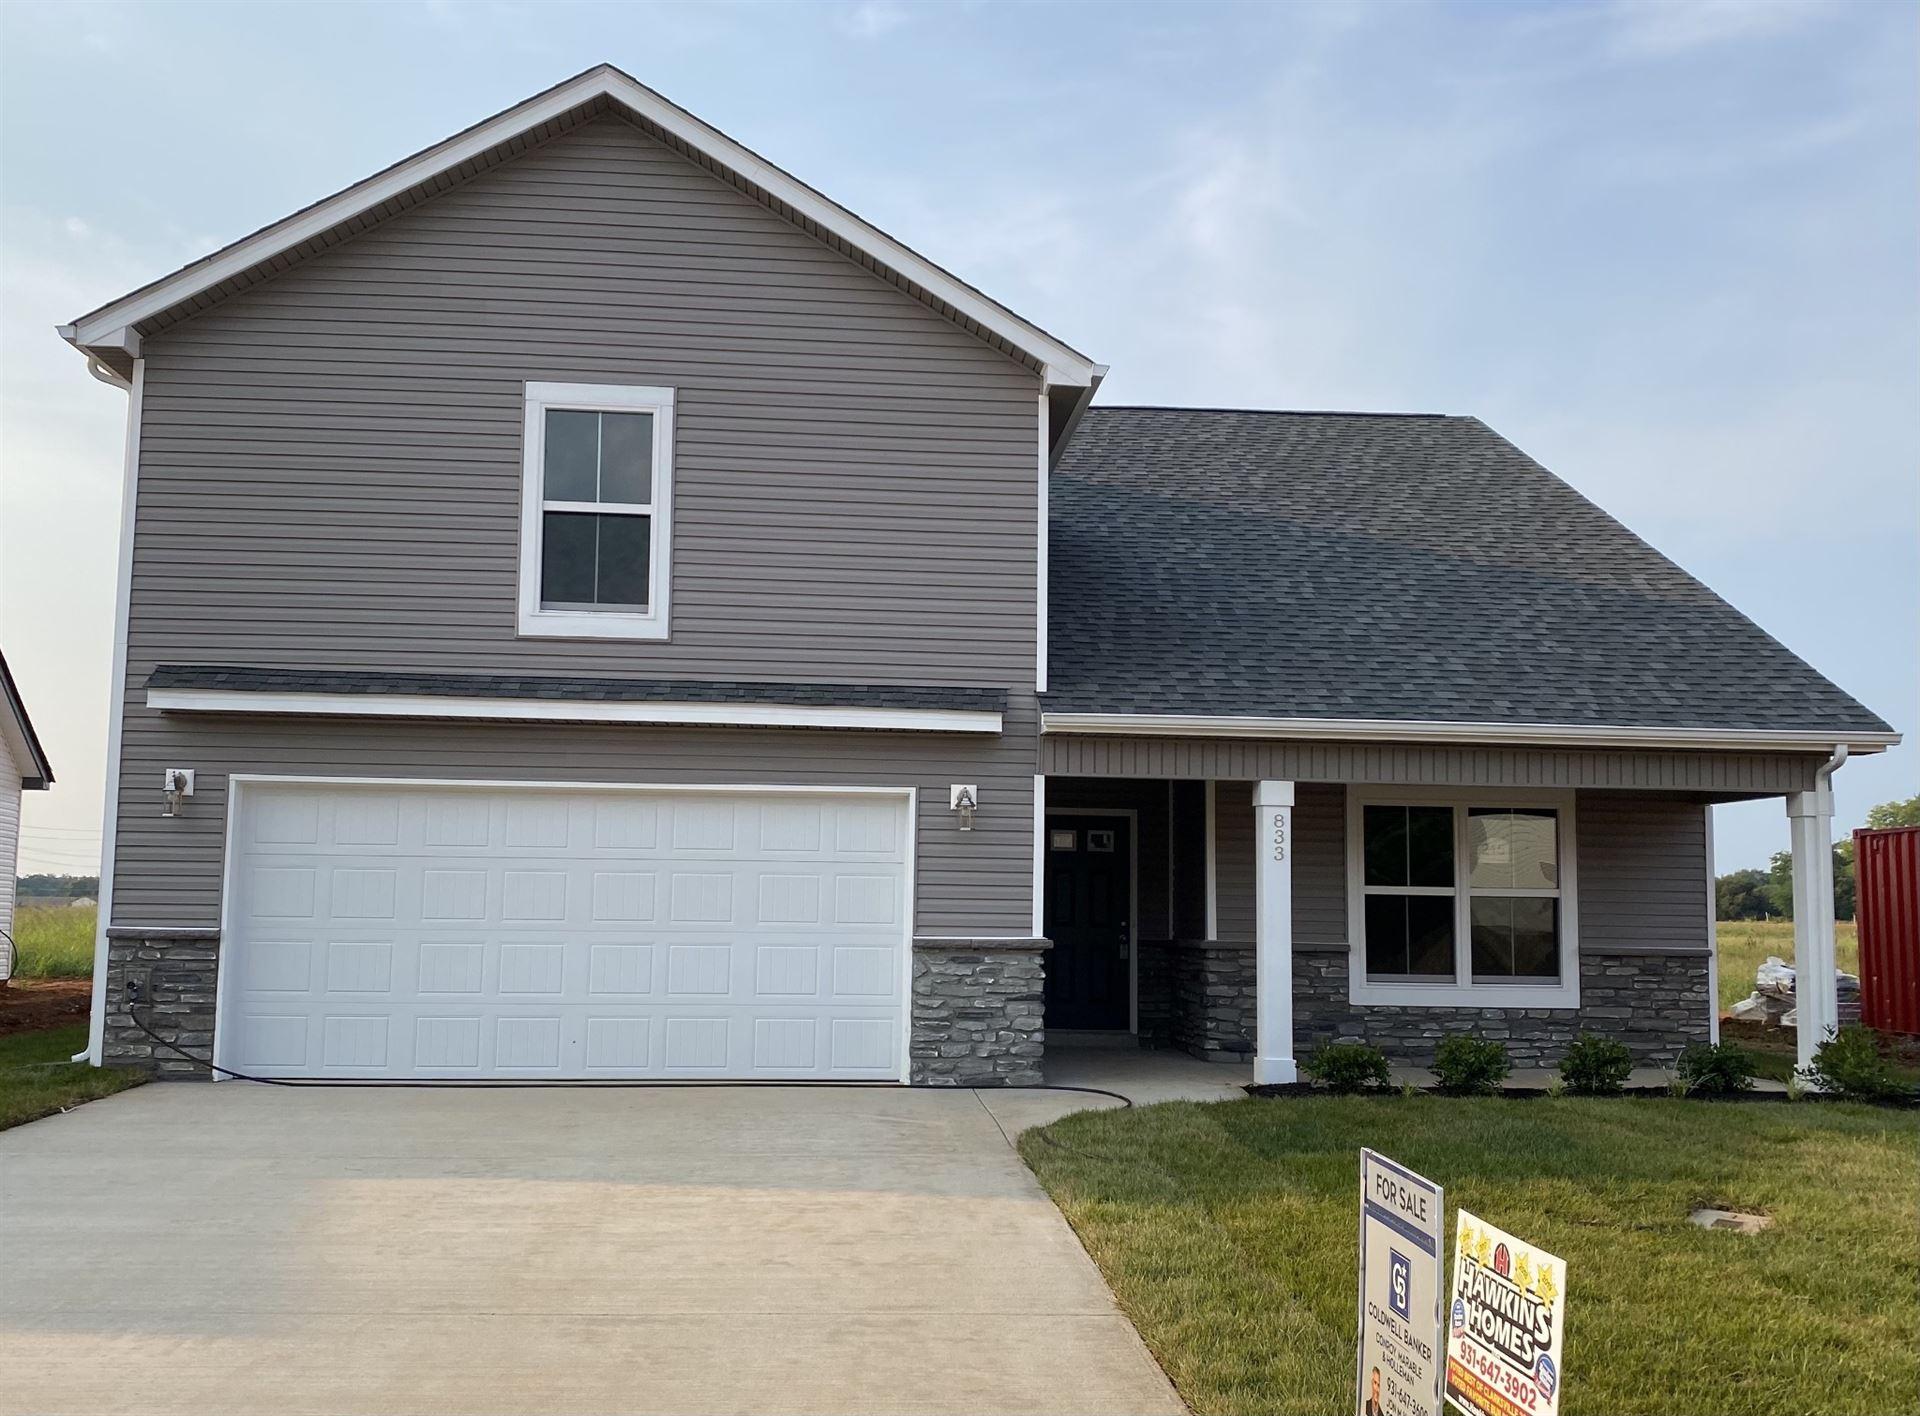 215 Mills Ctreek, Clarksville, TN 37042 - MLS#: 2262842